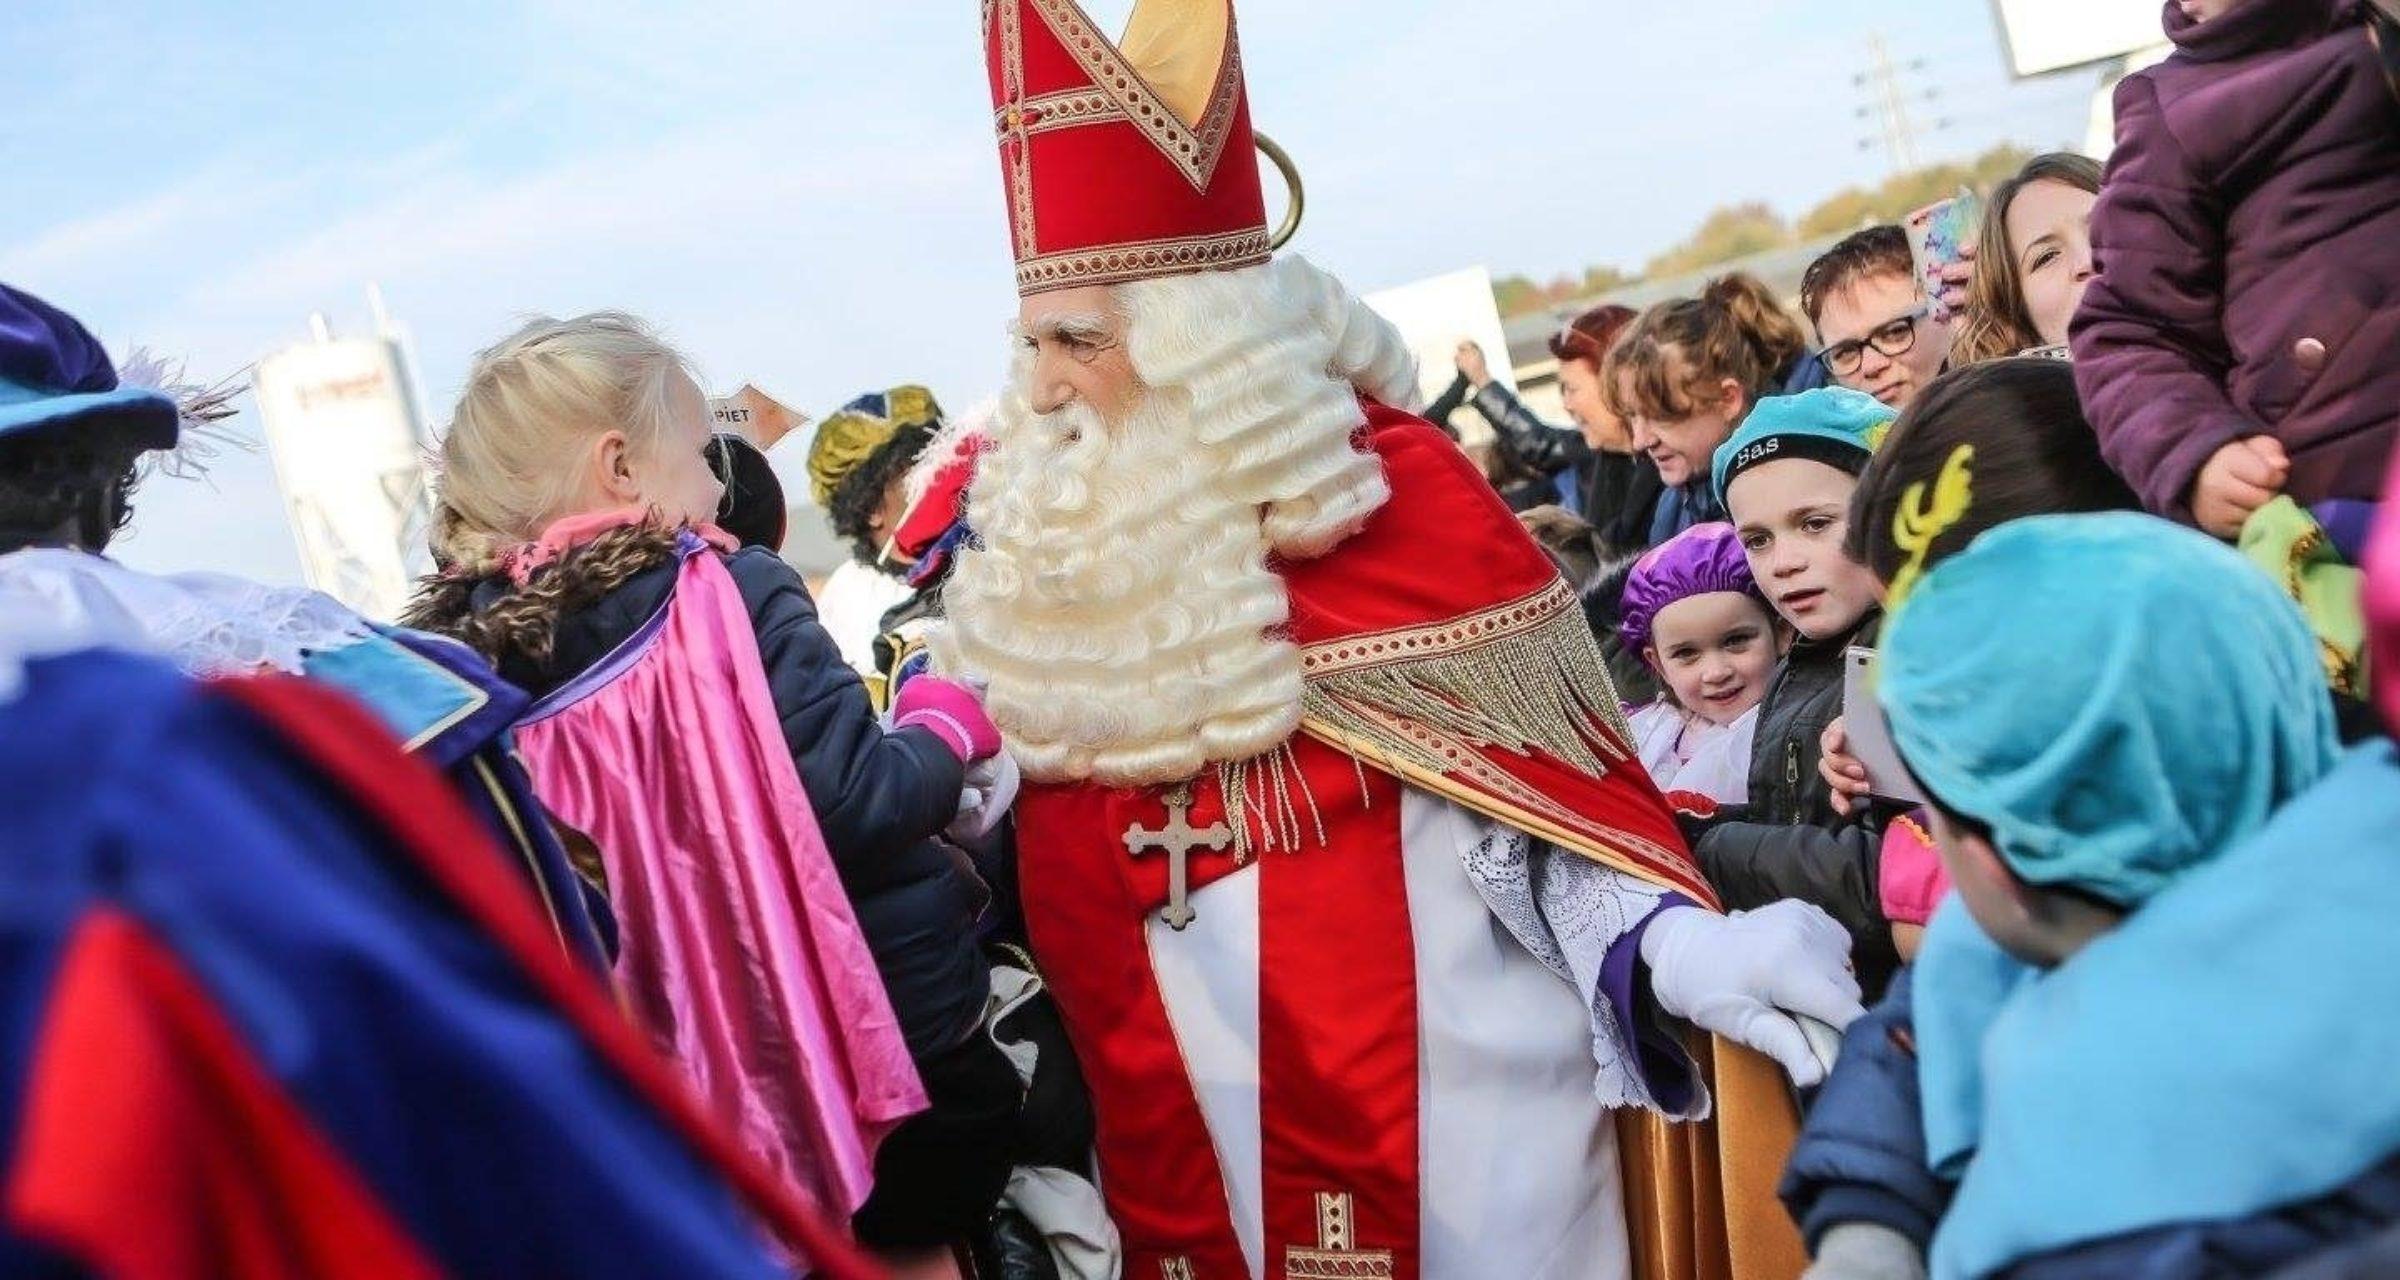 Sinterklaasintocht enschede zuid 1566 1539597681 35ht4lkni5